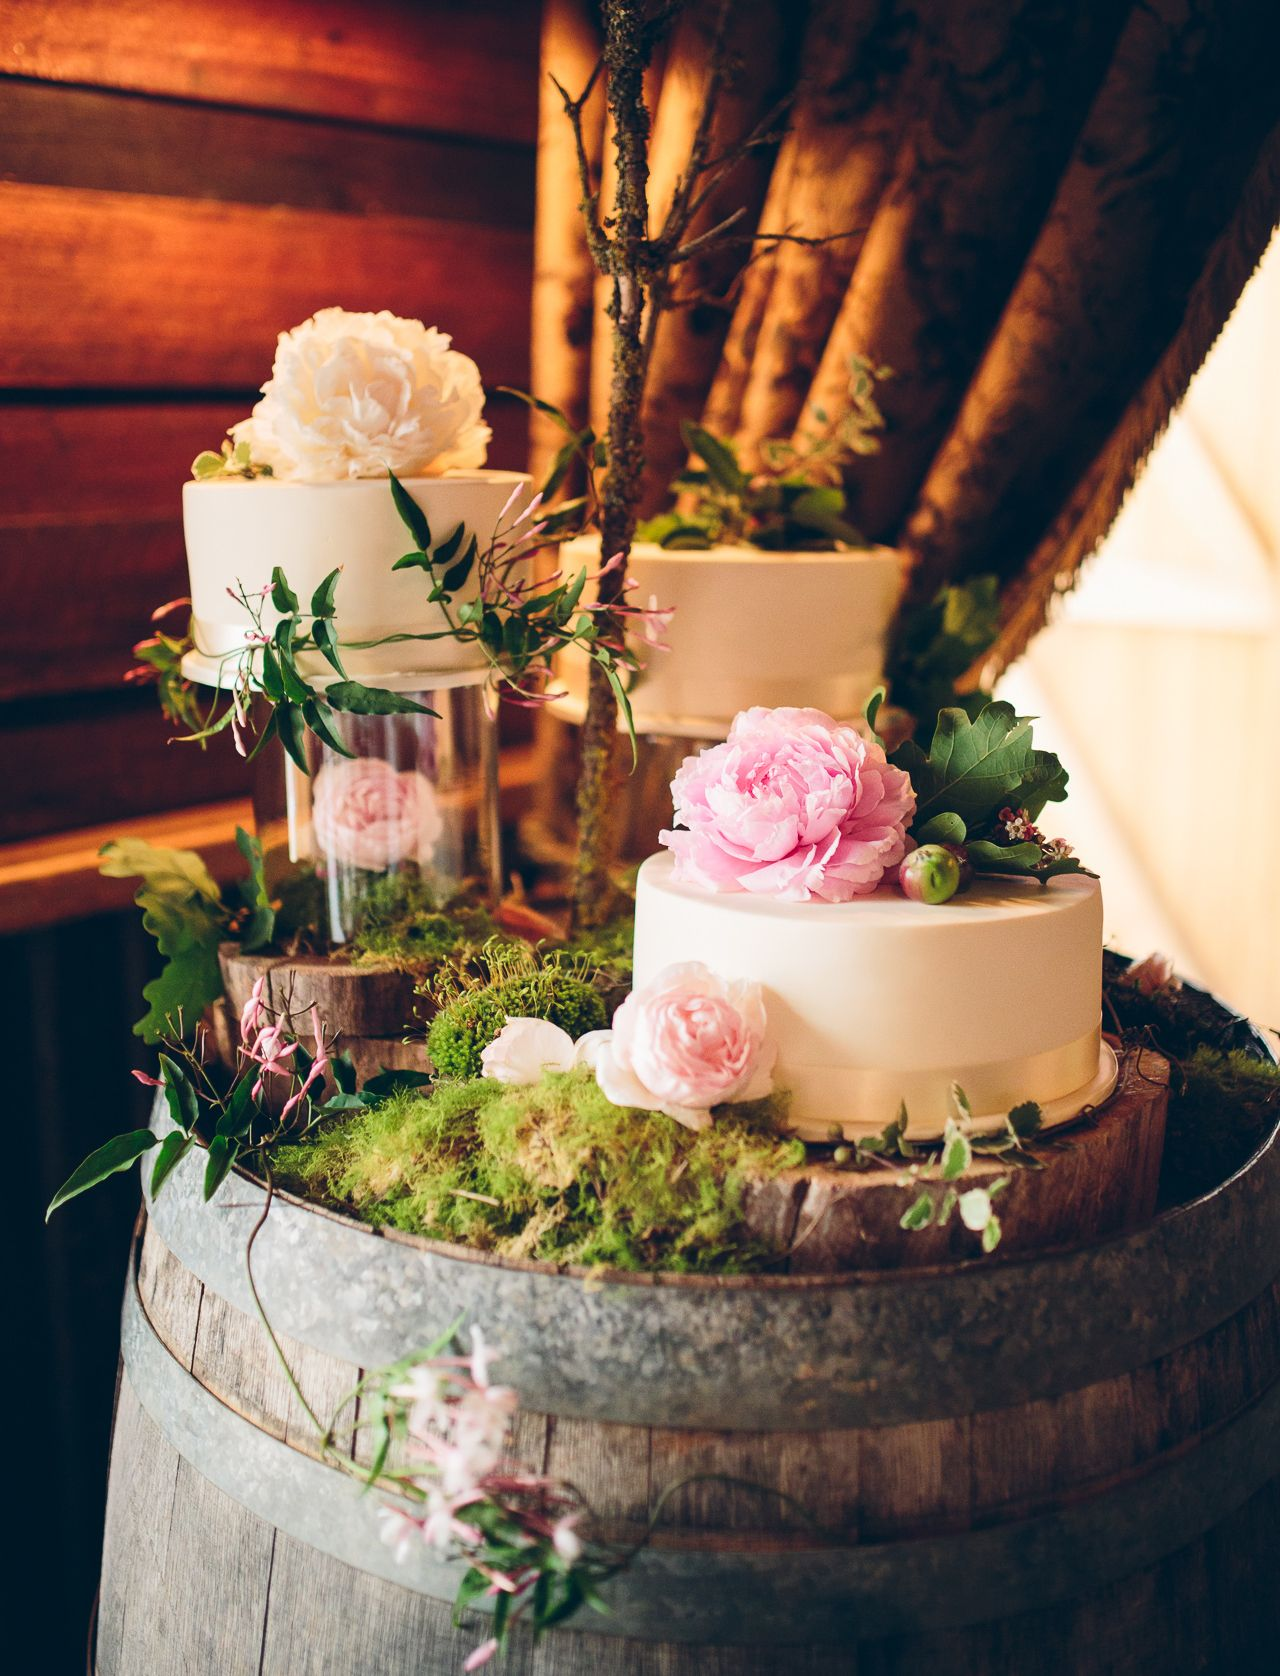 Chelsea sams rustic trentham wedding wedding cake